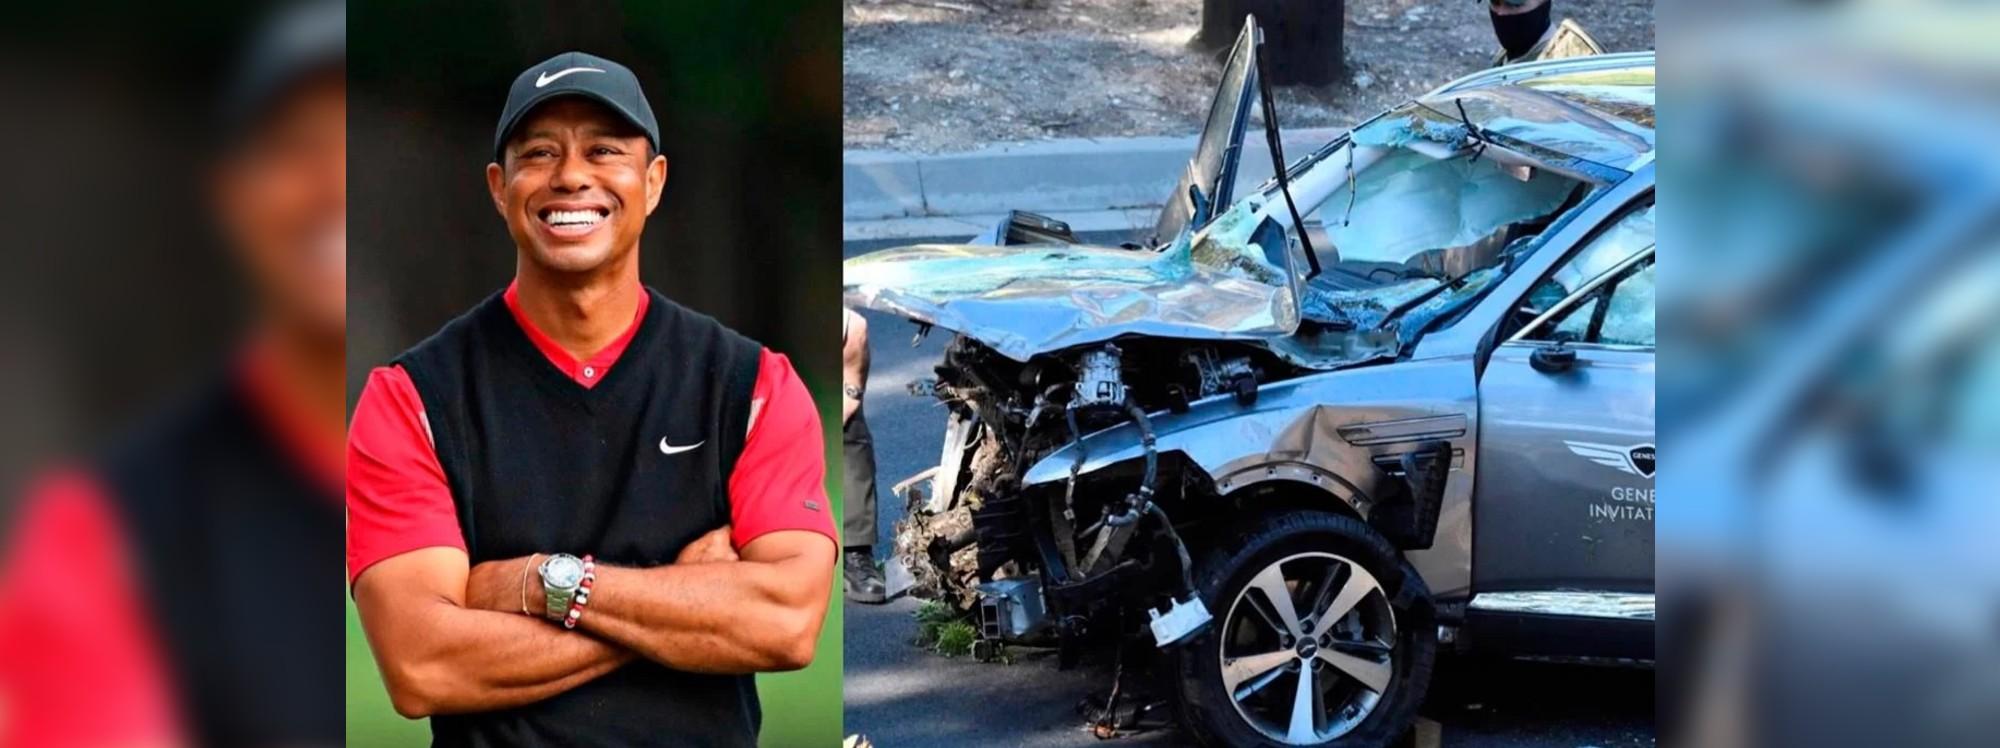 La Genesis GV80 salvó la vida a Tiger Woods